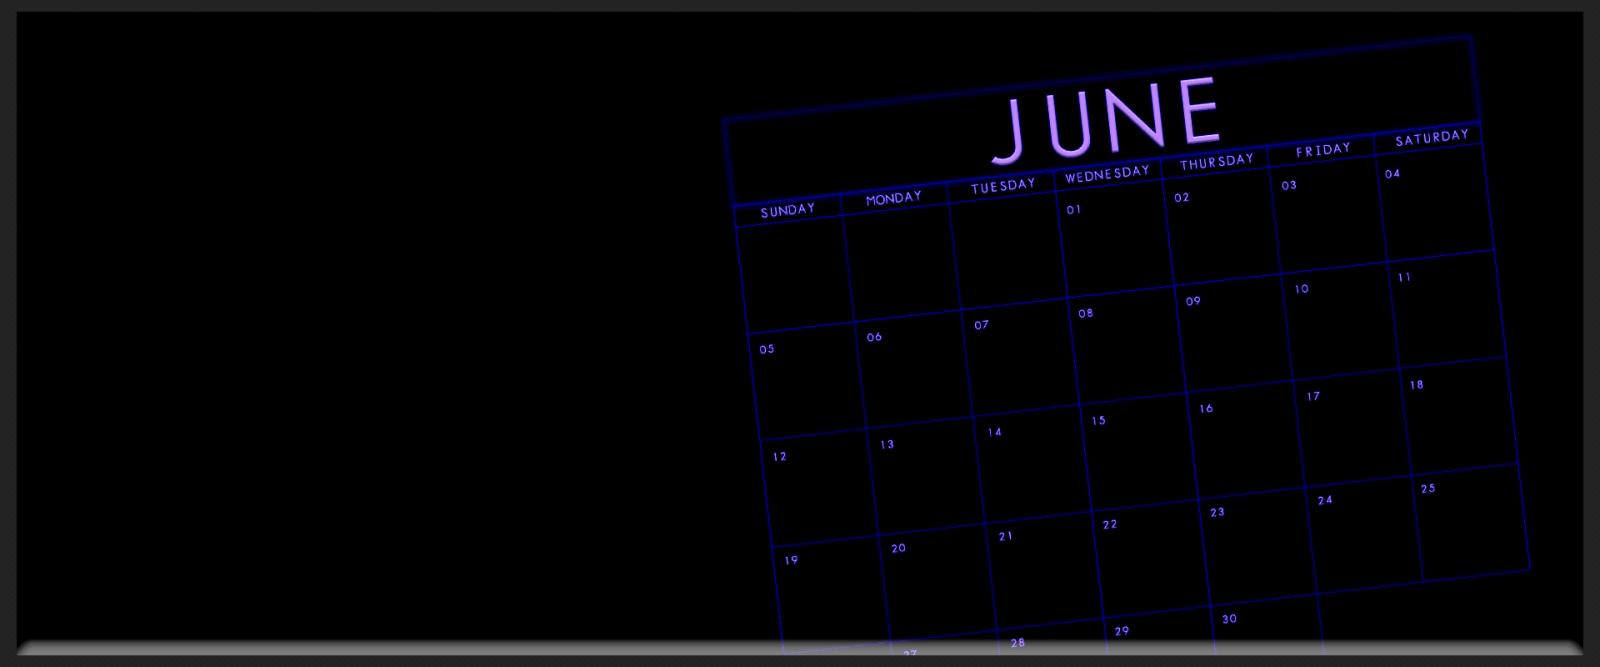 20160711-June-Review